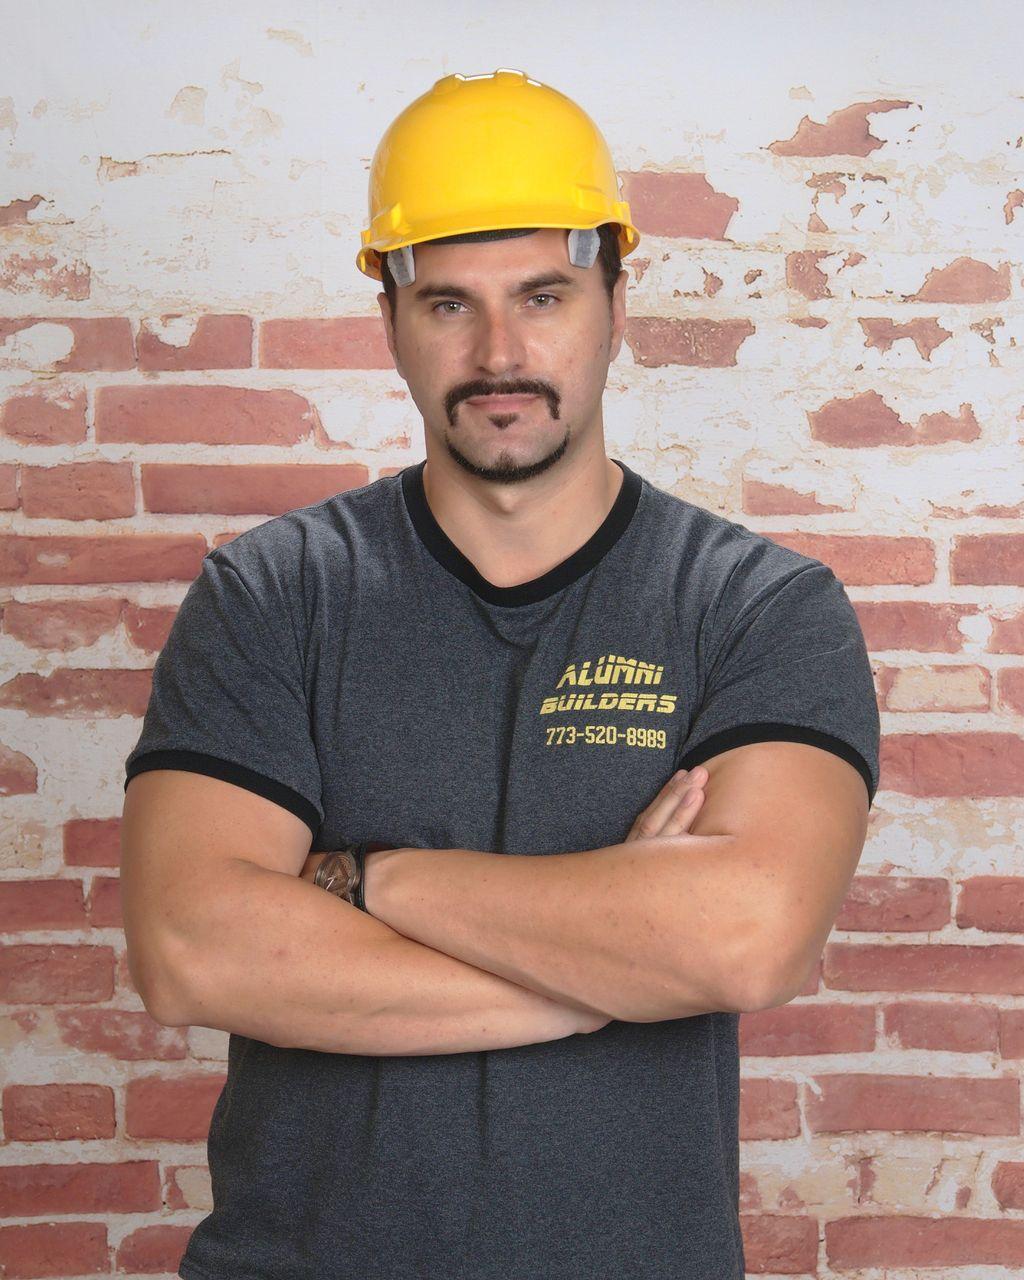 Alumni Builders Inc